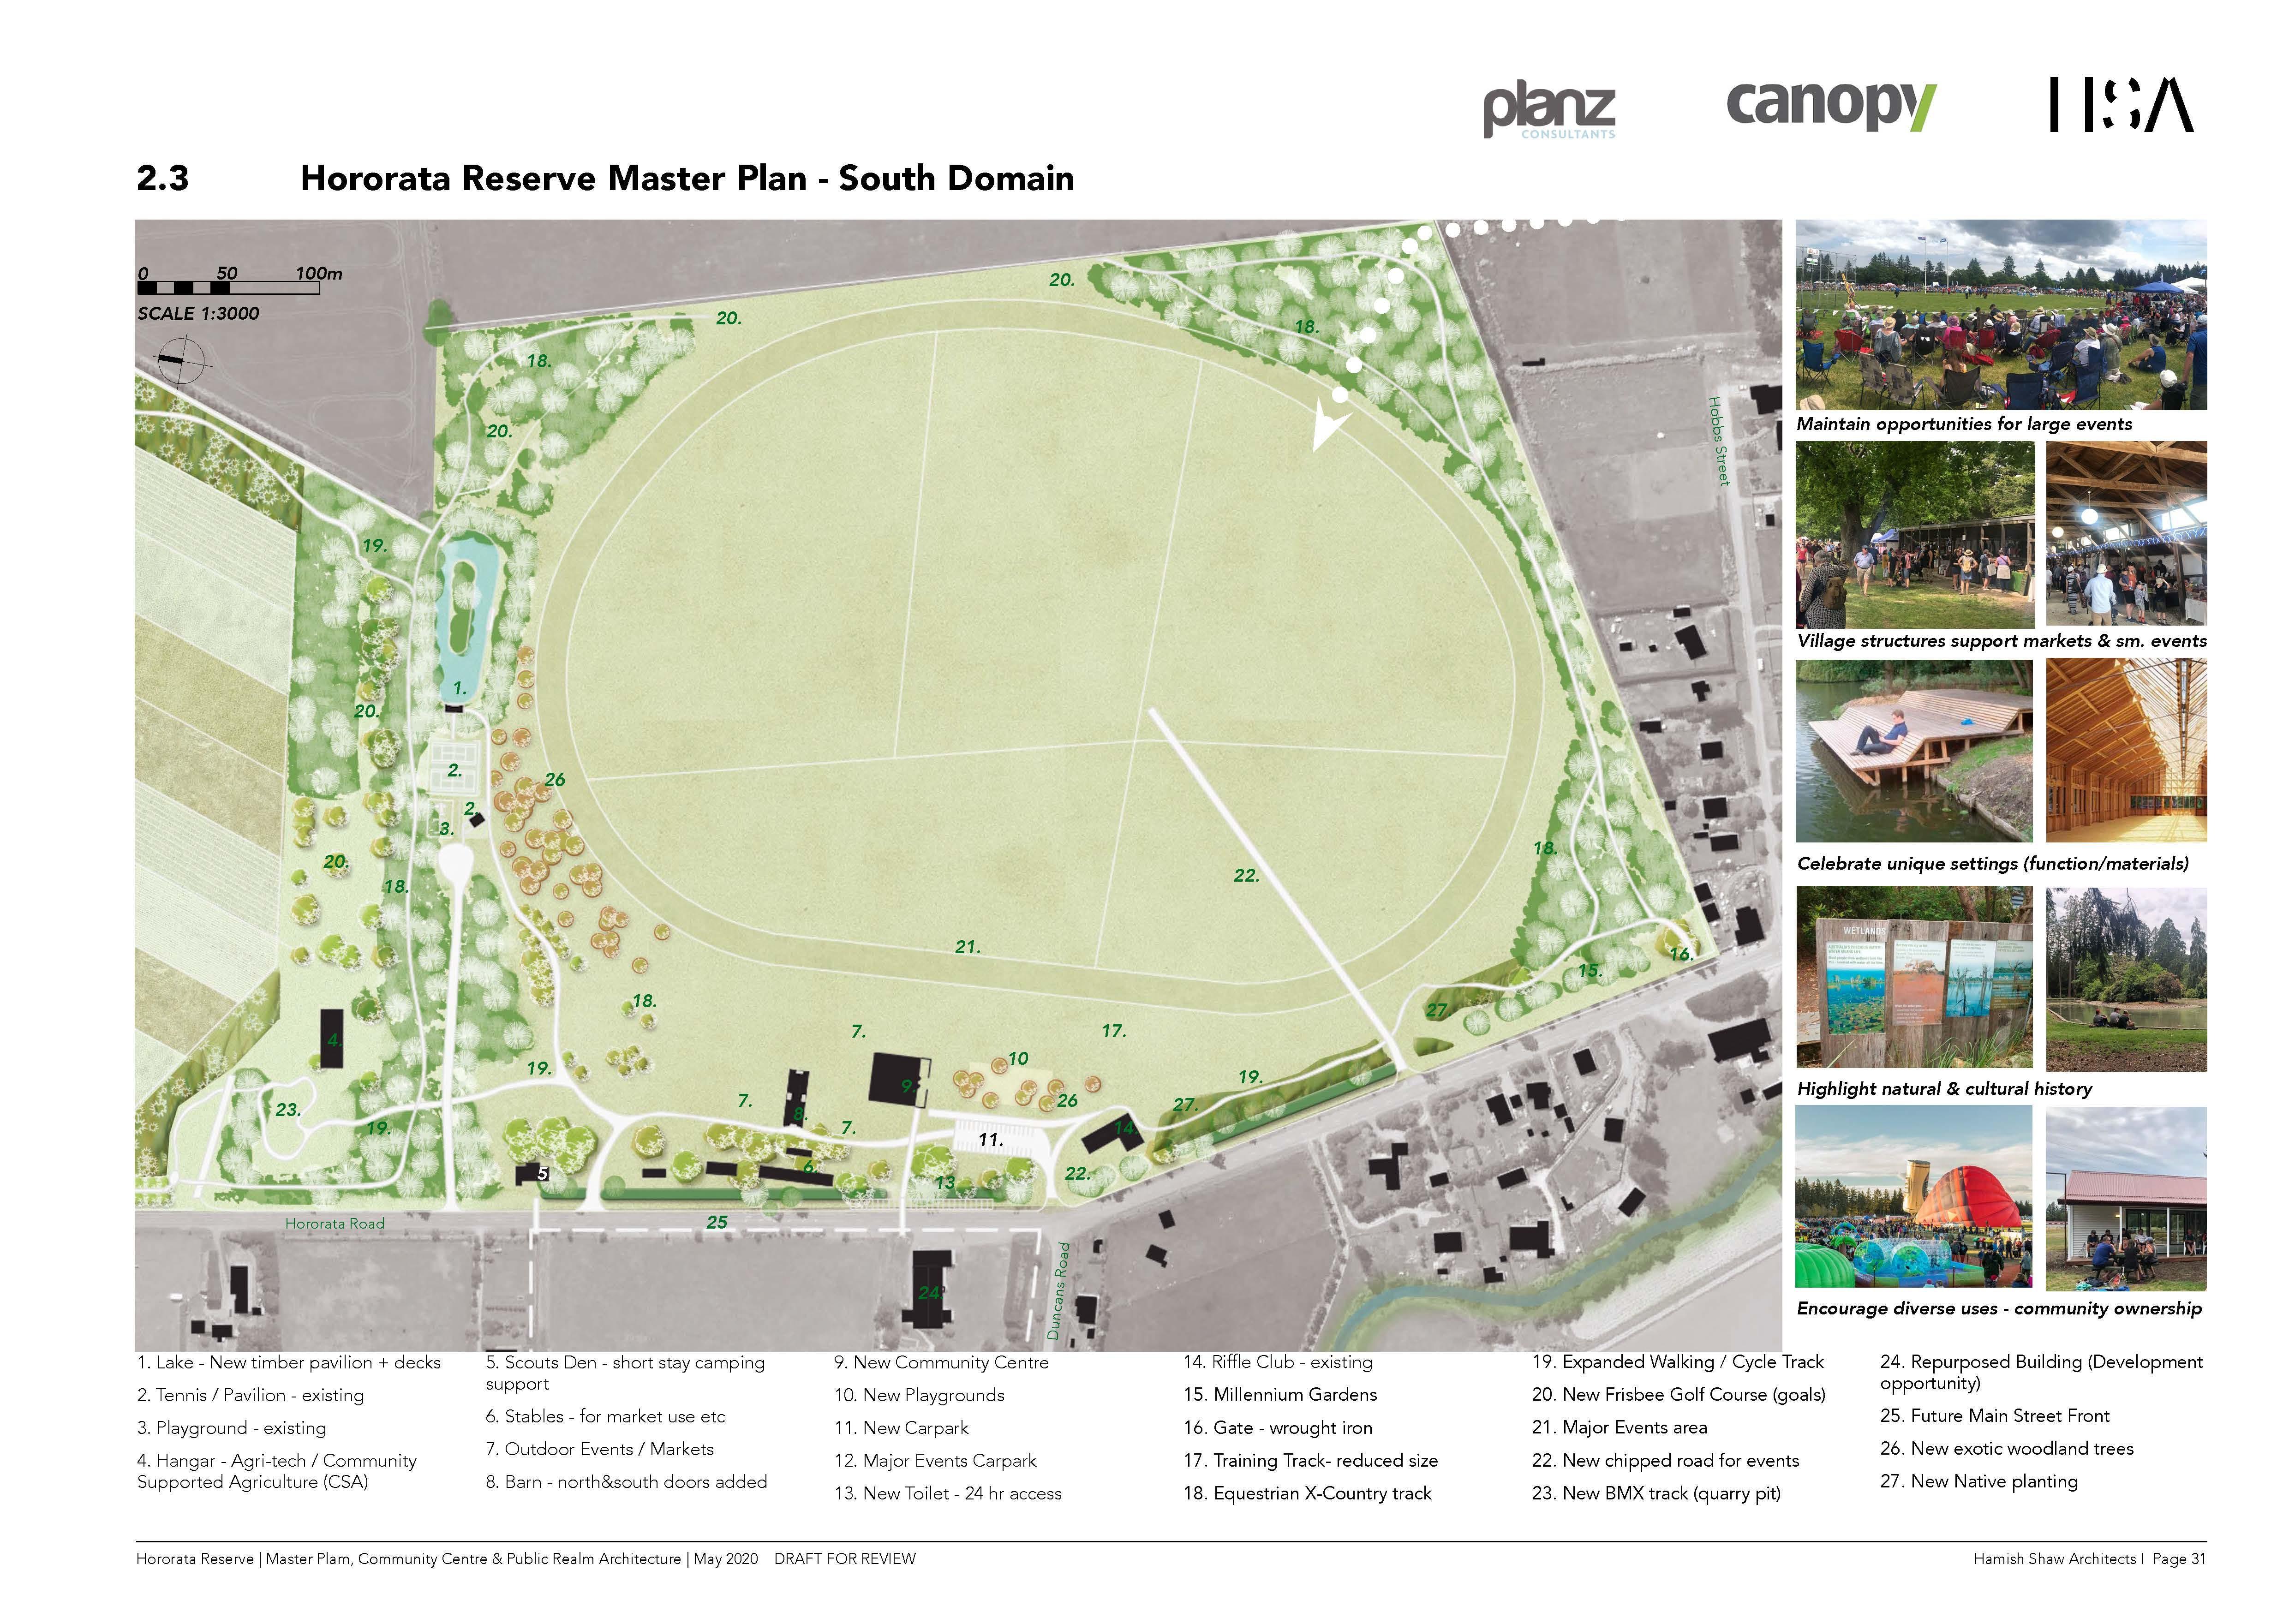 Hororata Reserve Master Plan - South domain